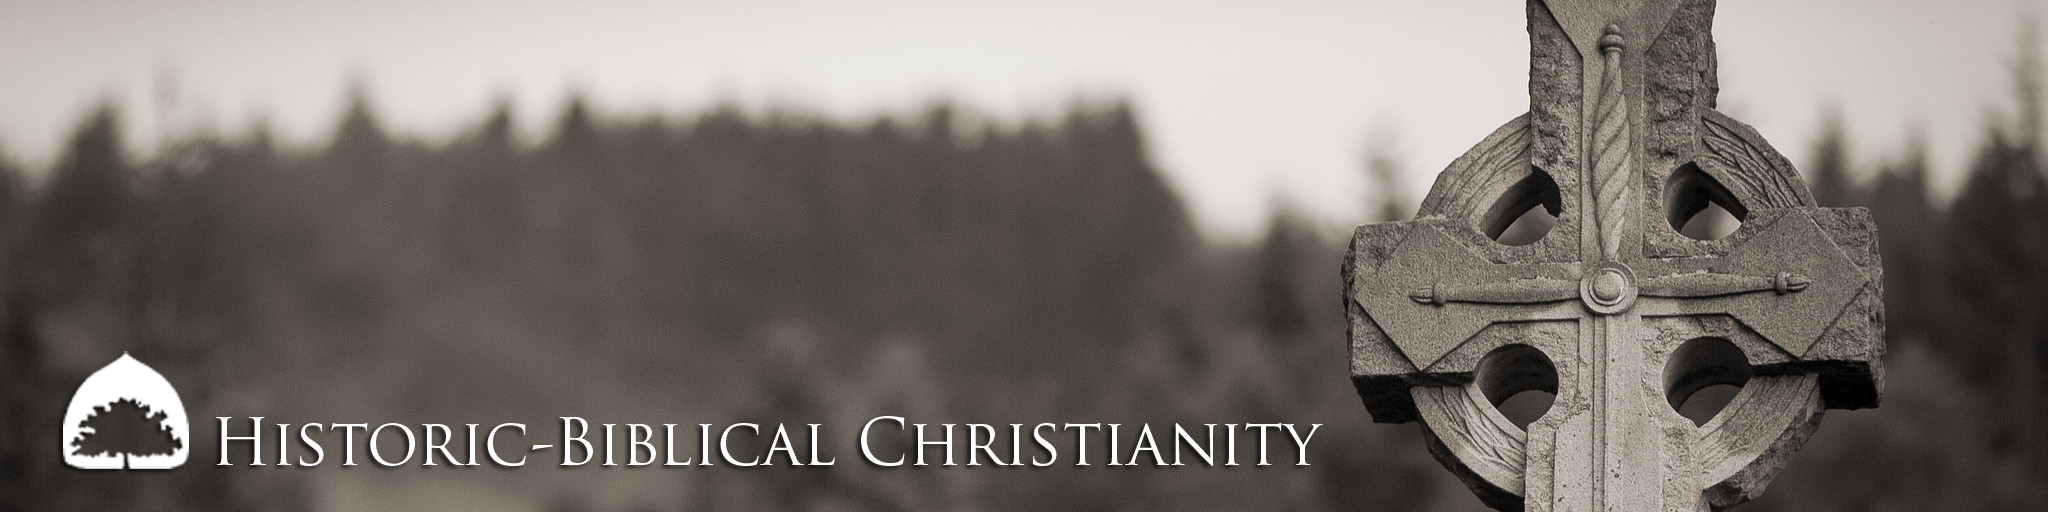 03.Historic-Biblical Christianity.jpg